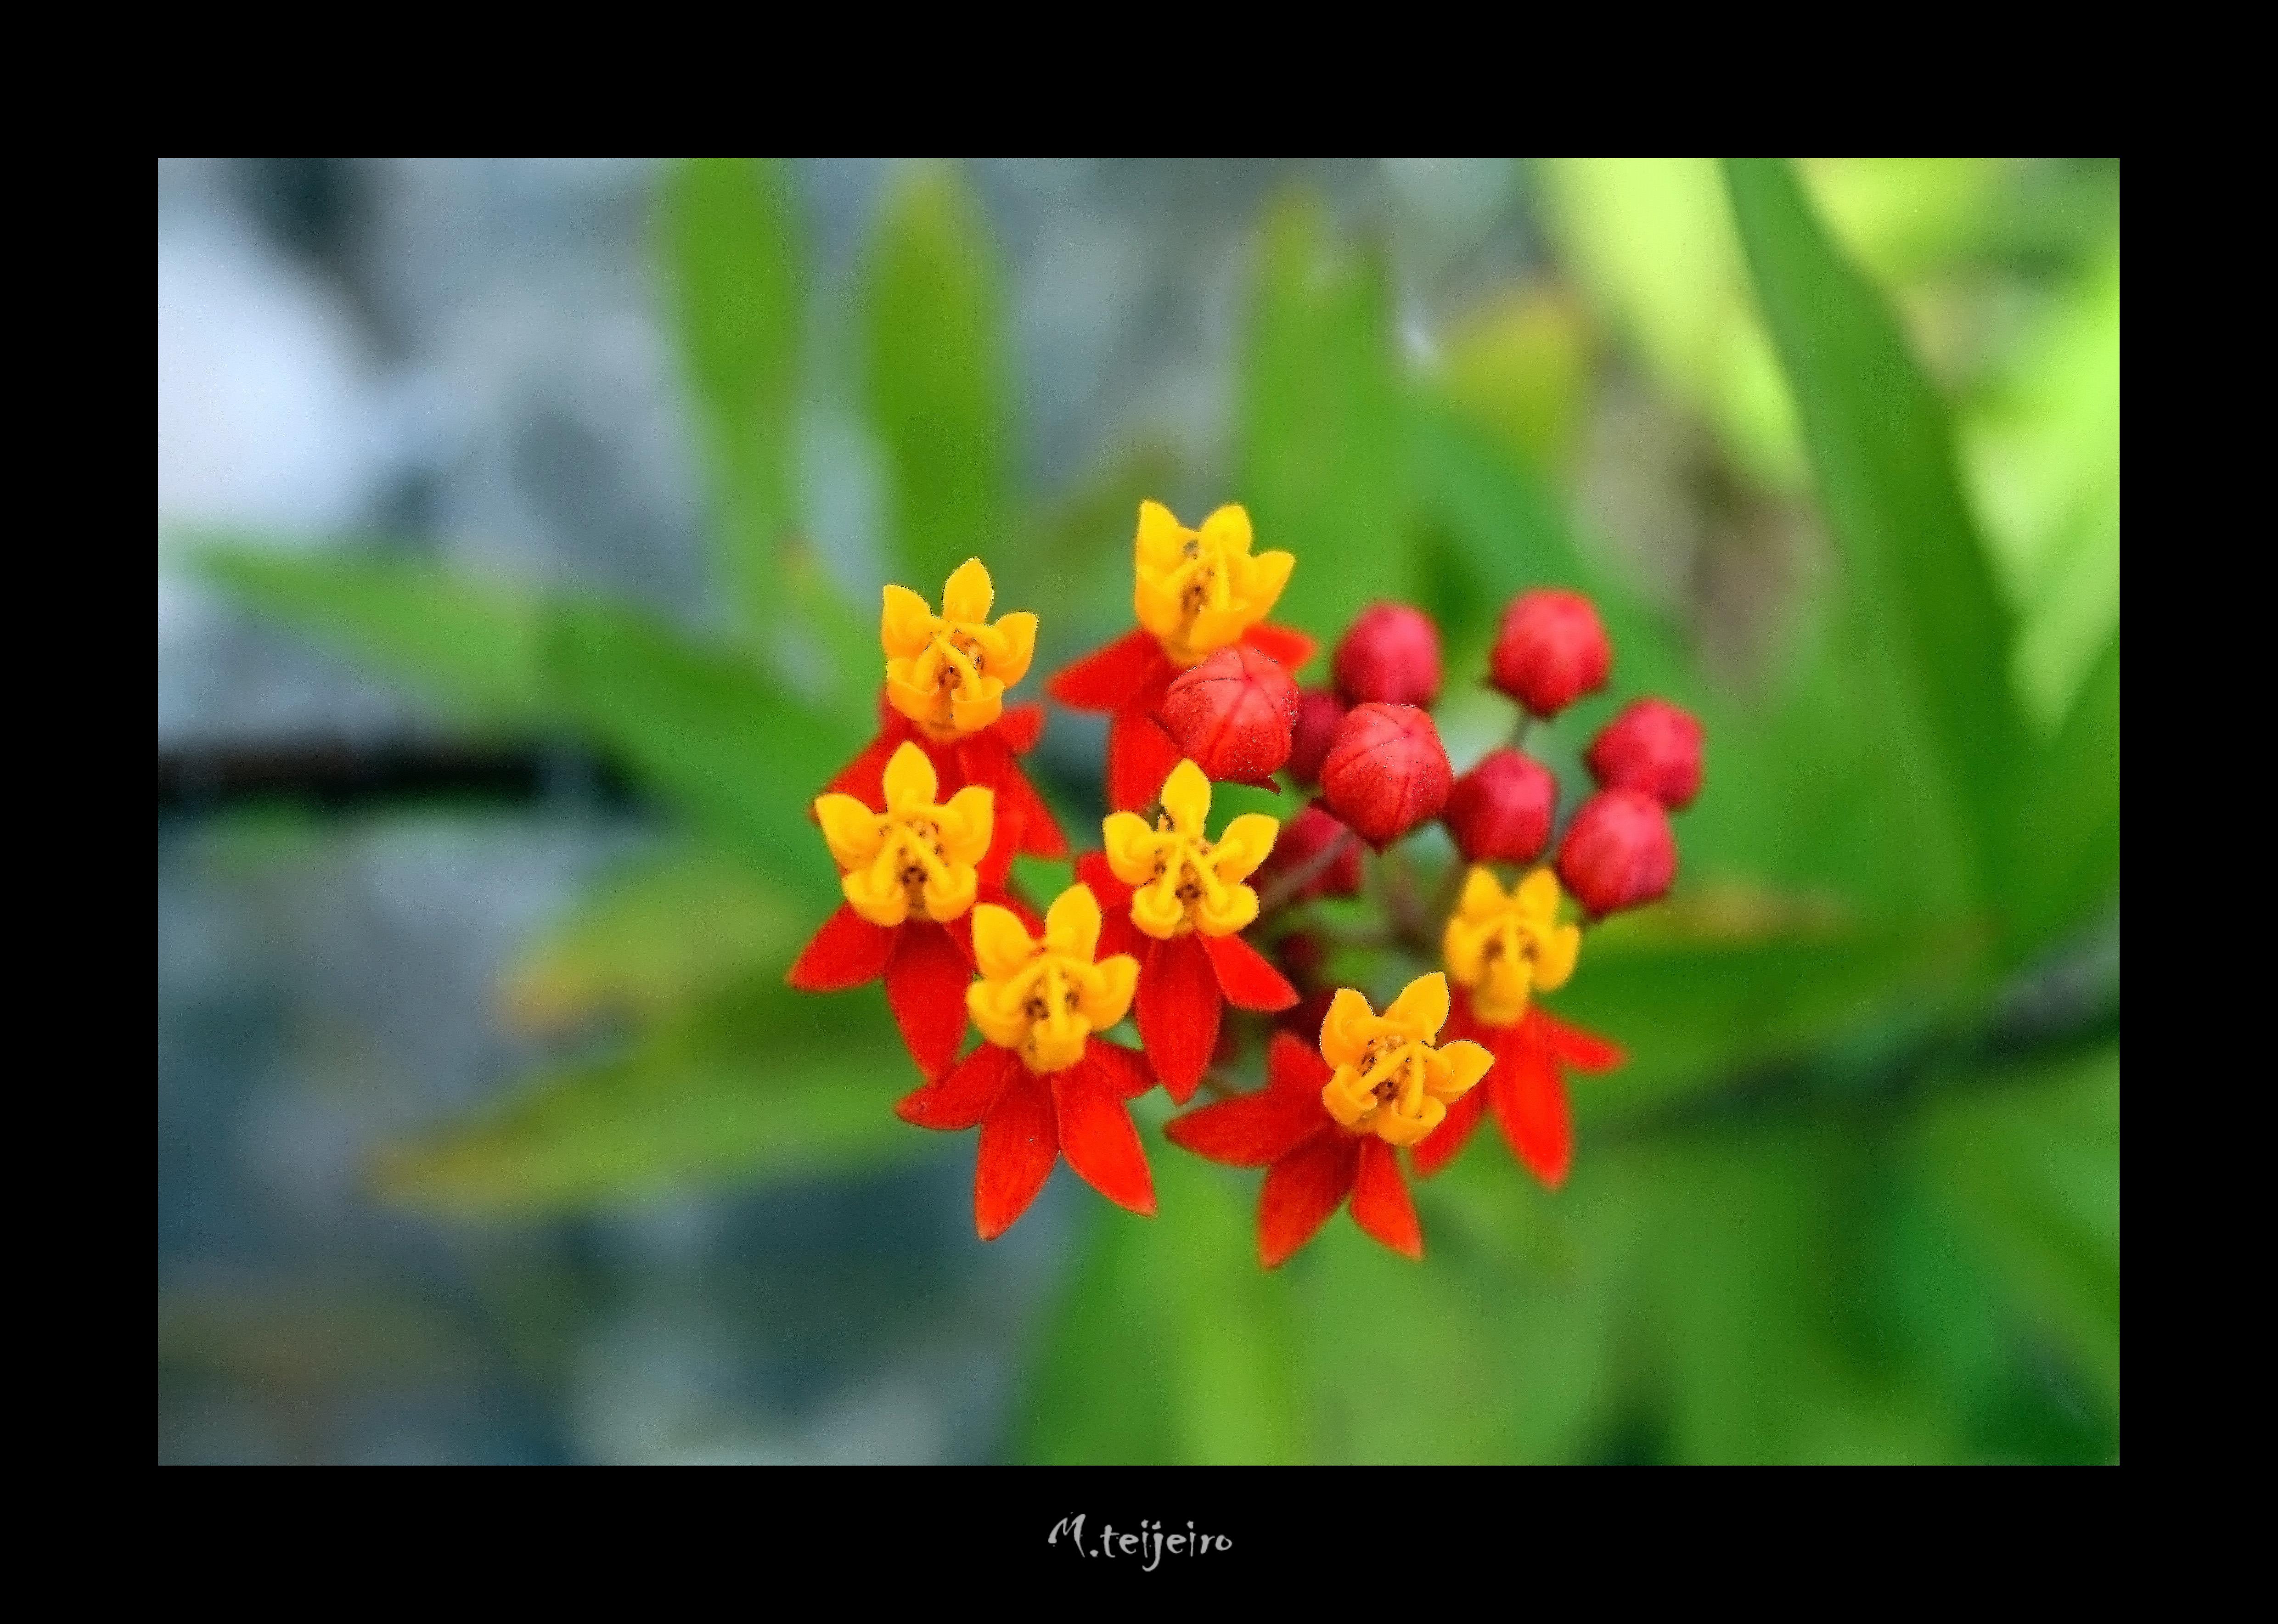 ASCLEPIAS CURASSAVICA (Flor de sangre) | Explore mikel990 ...